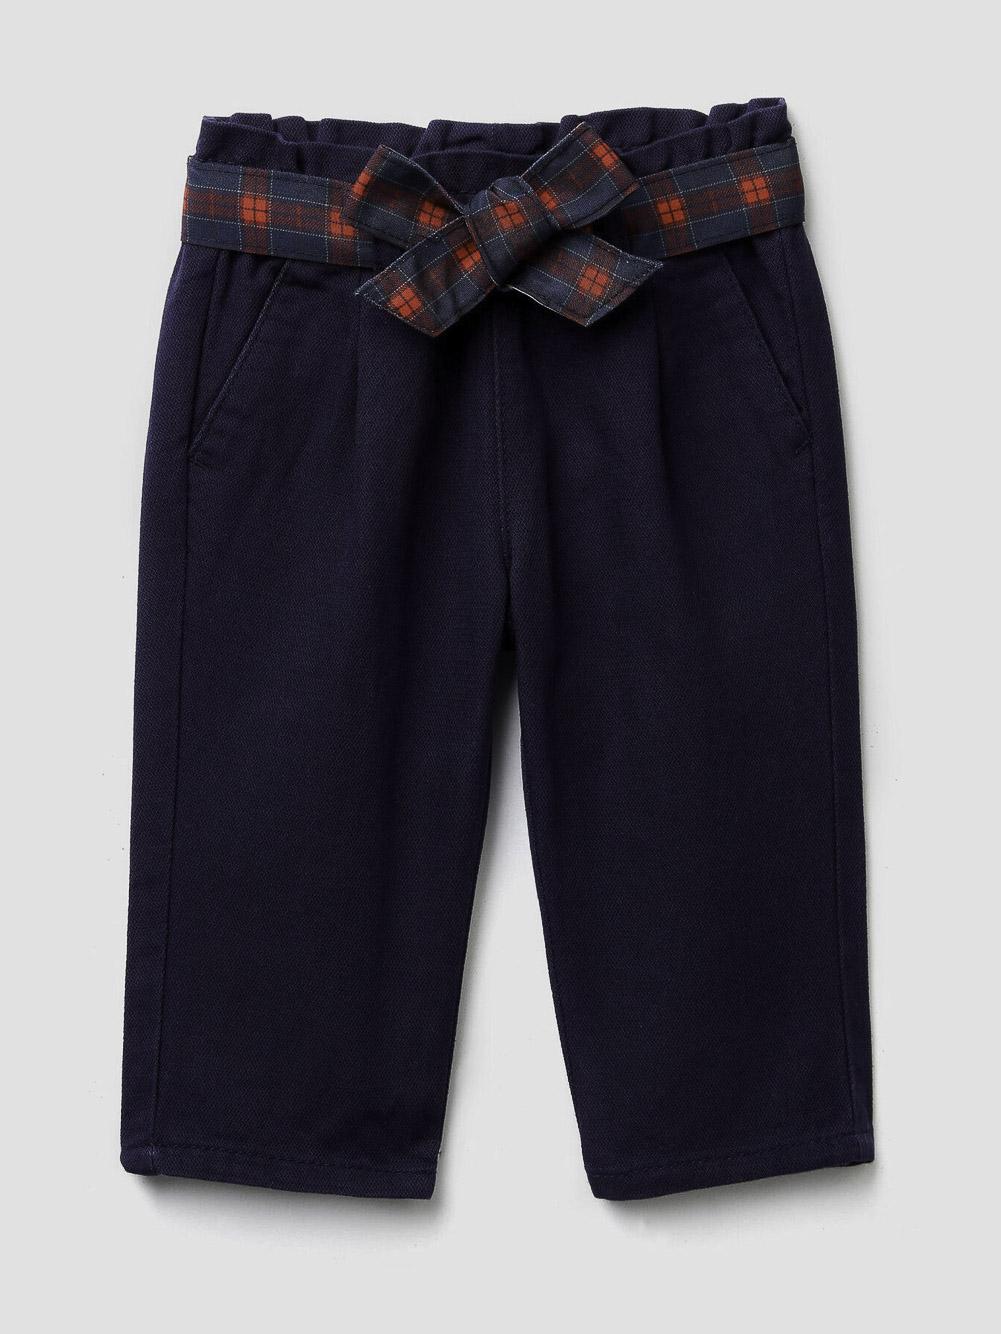 012 BENETTON Παντελόνι με ζώνη καρό από denim 4BBZ55C30 20A252